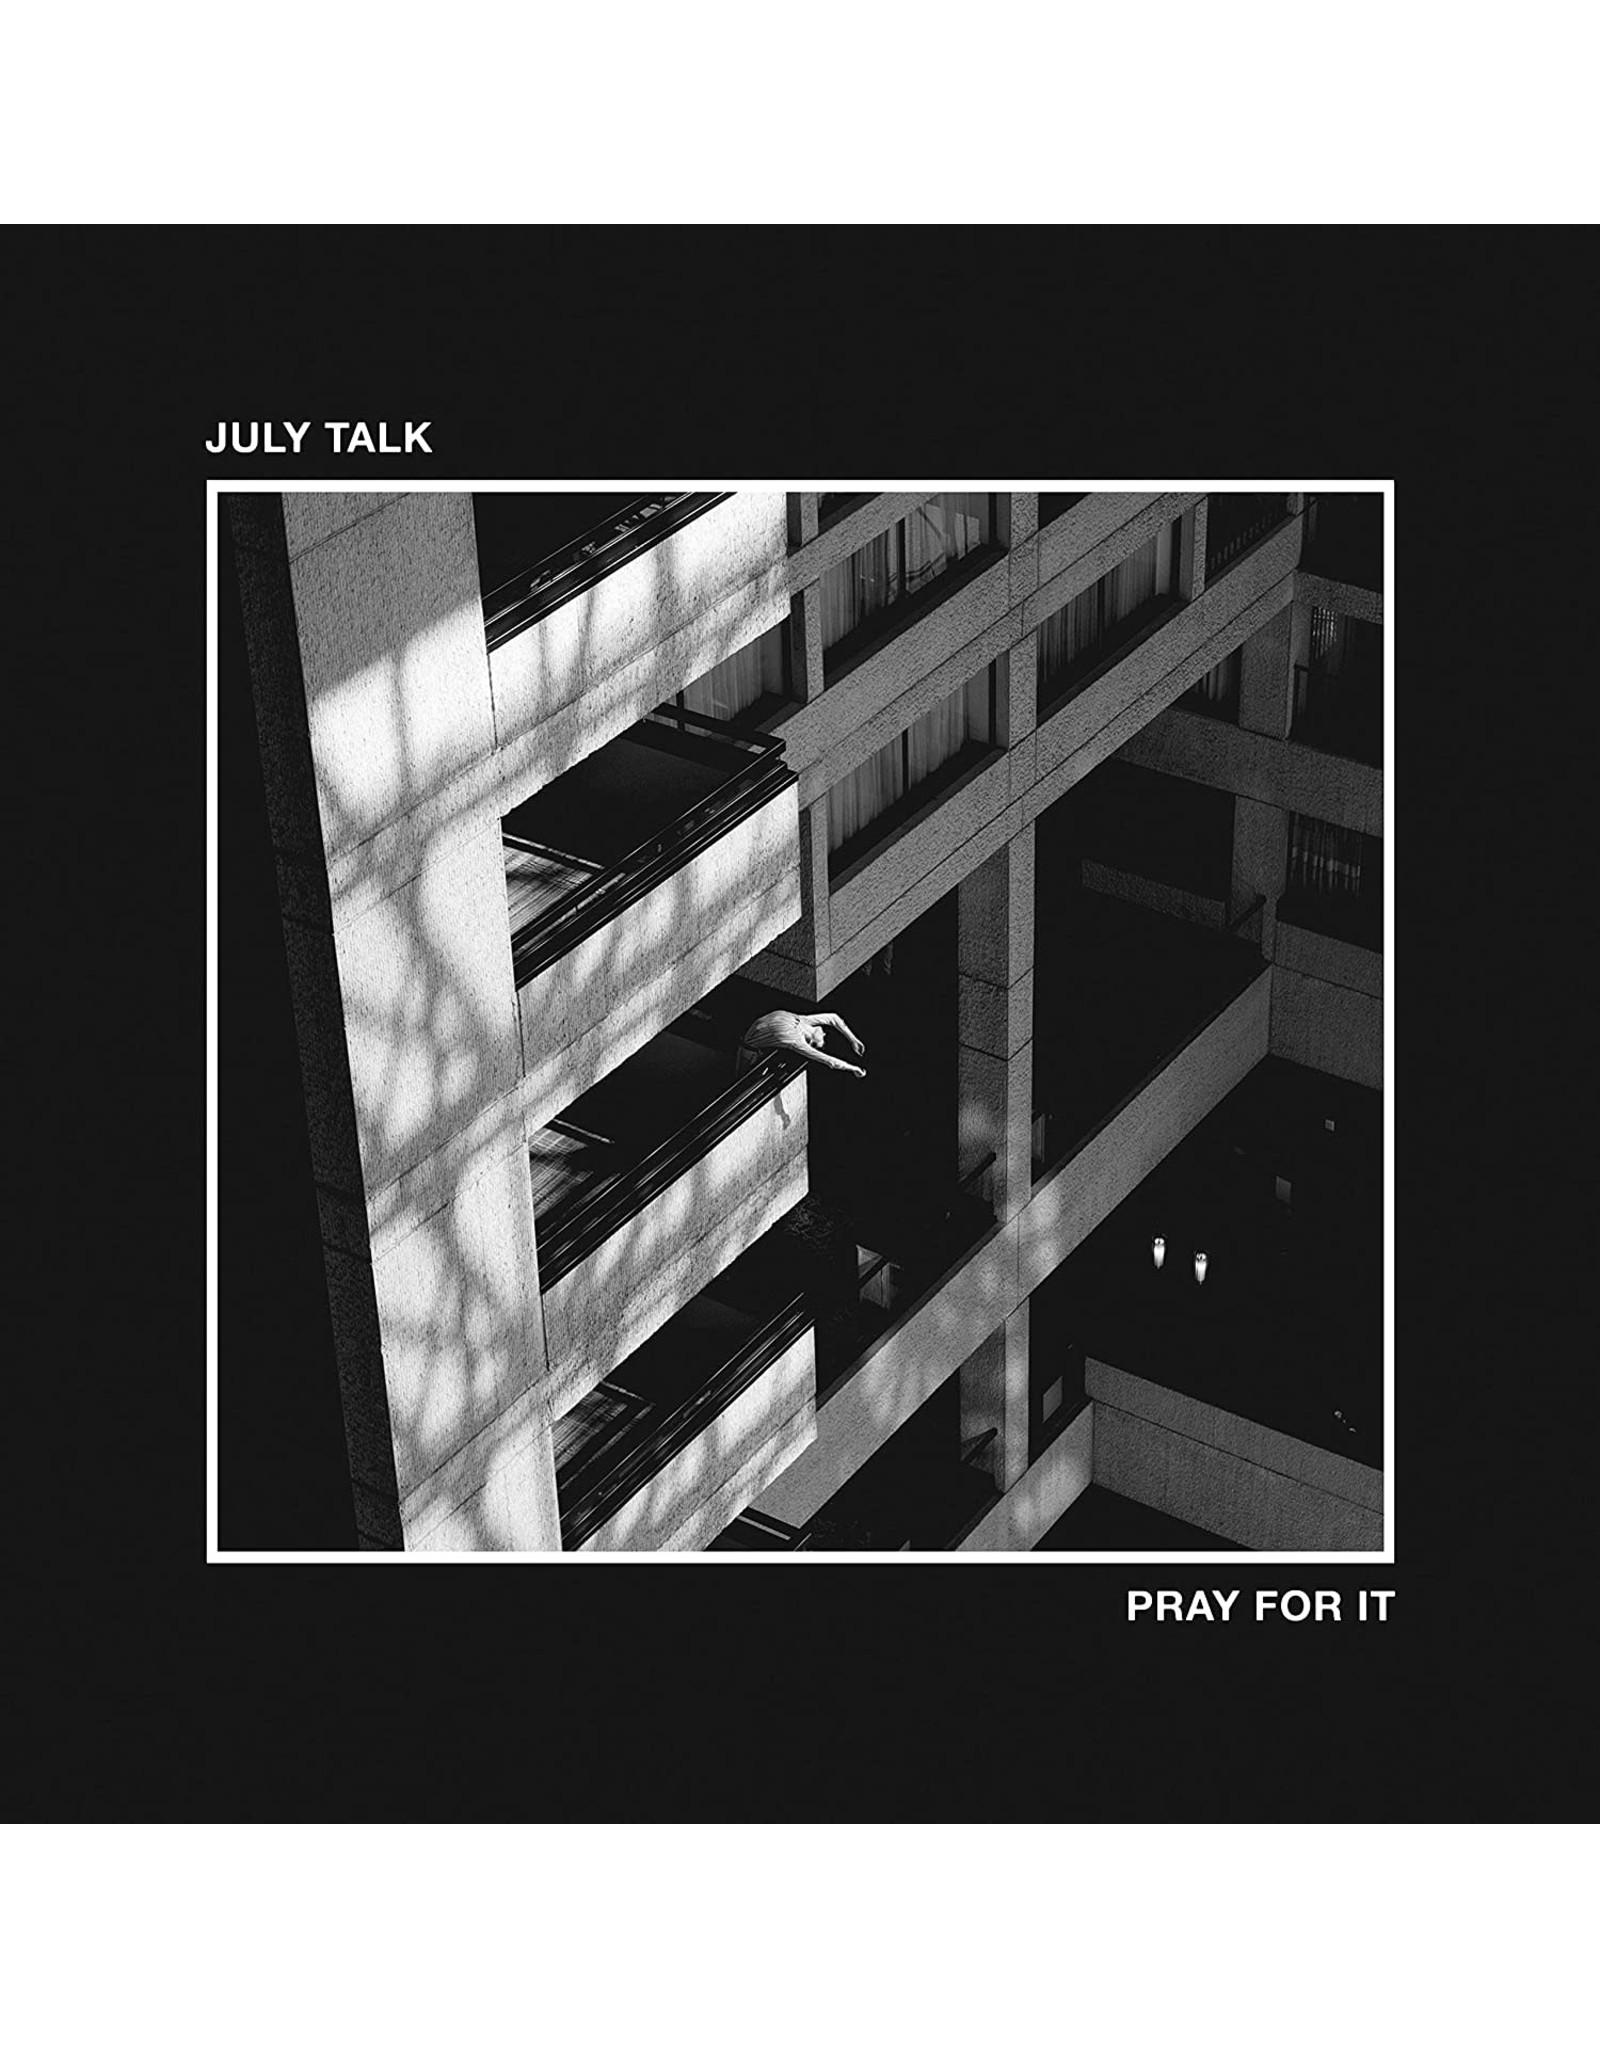 July Talk - Pray For It